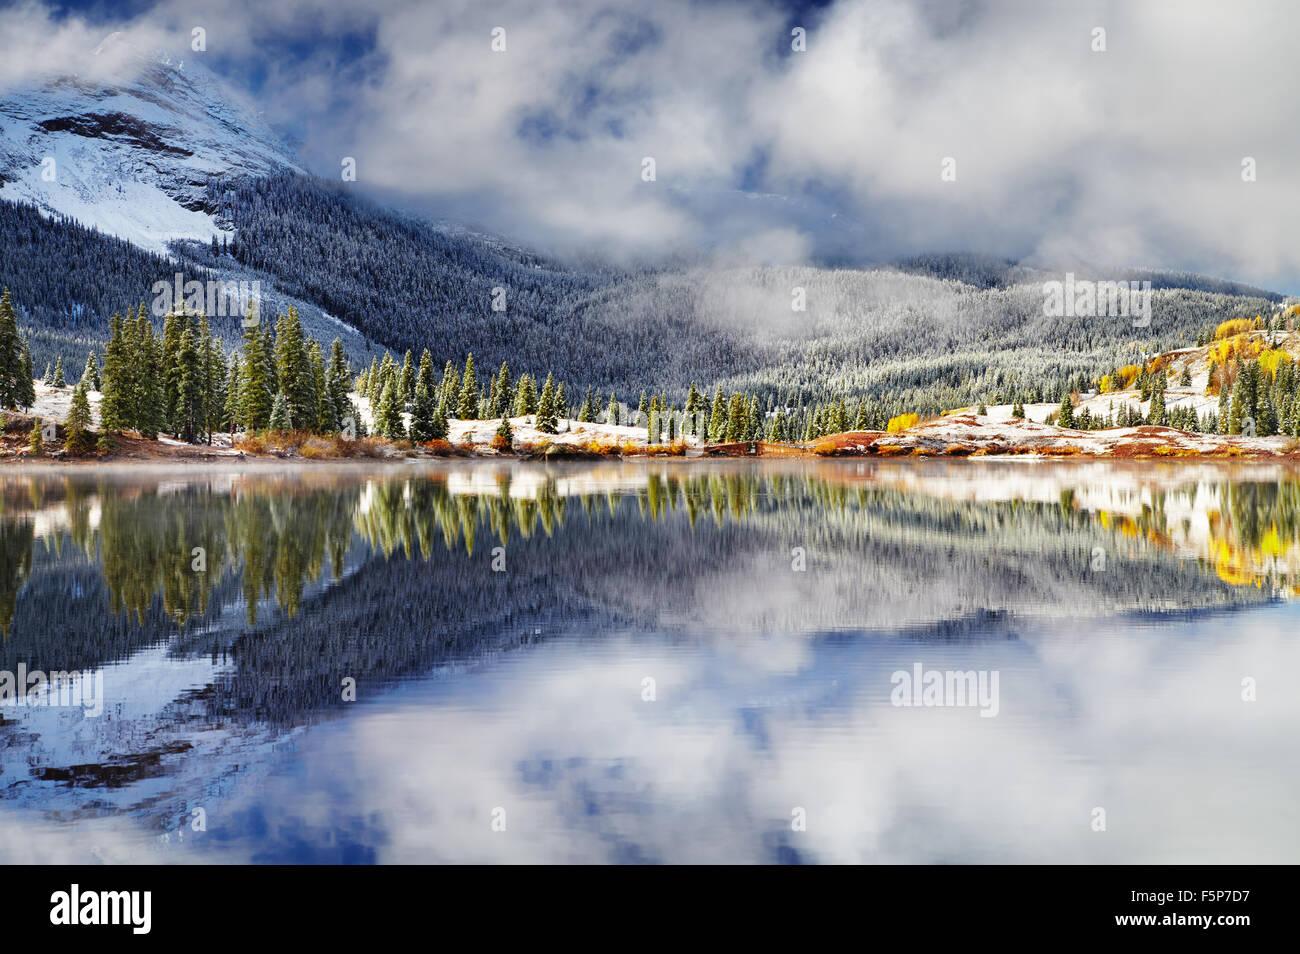 Bergsee nach dem Schneesturm. Molas See, San Juan Mountains, Colorado, USA Stockbild